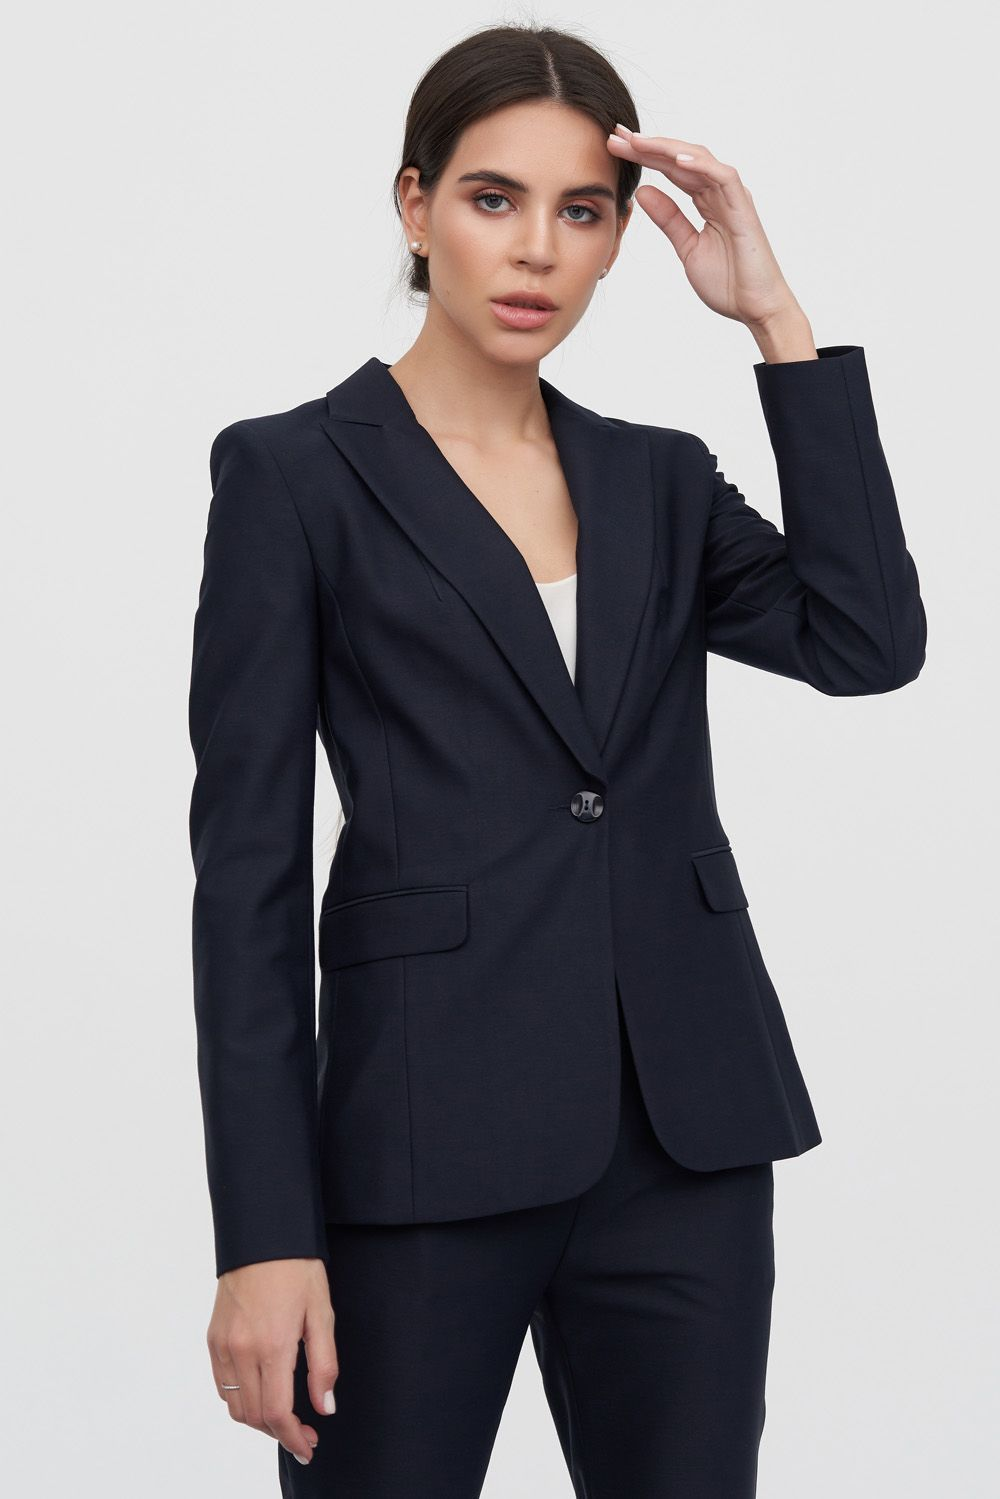 Жакет женские Natali Bolgar модель 817DRMAD77 цена, 2017